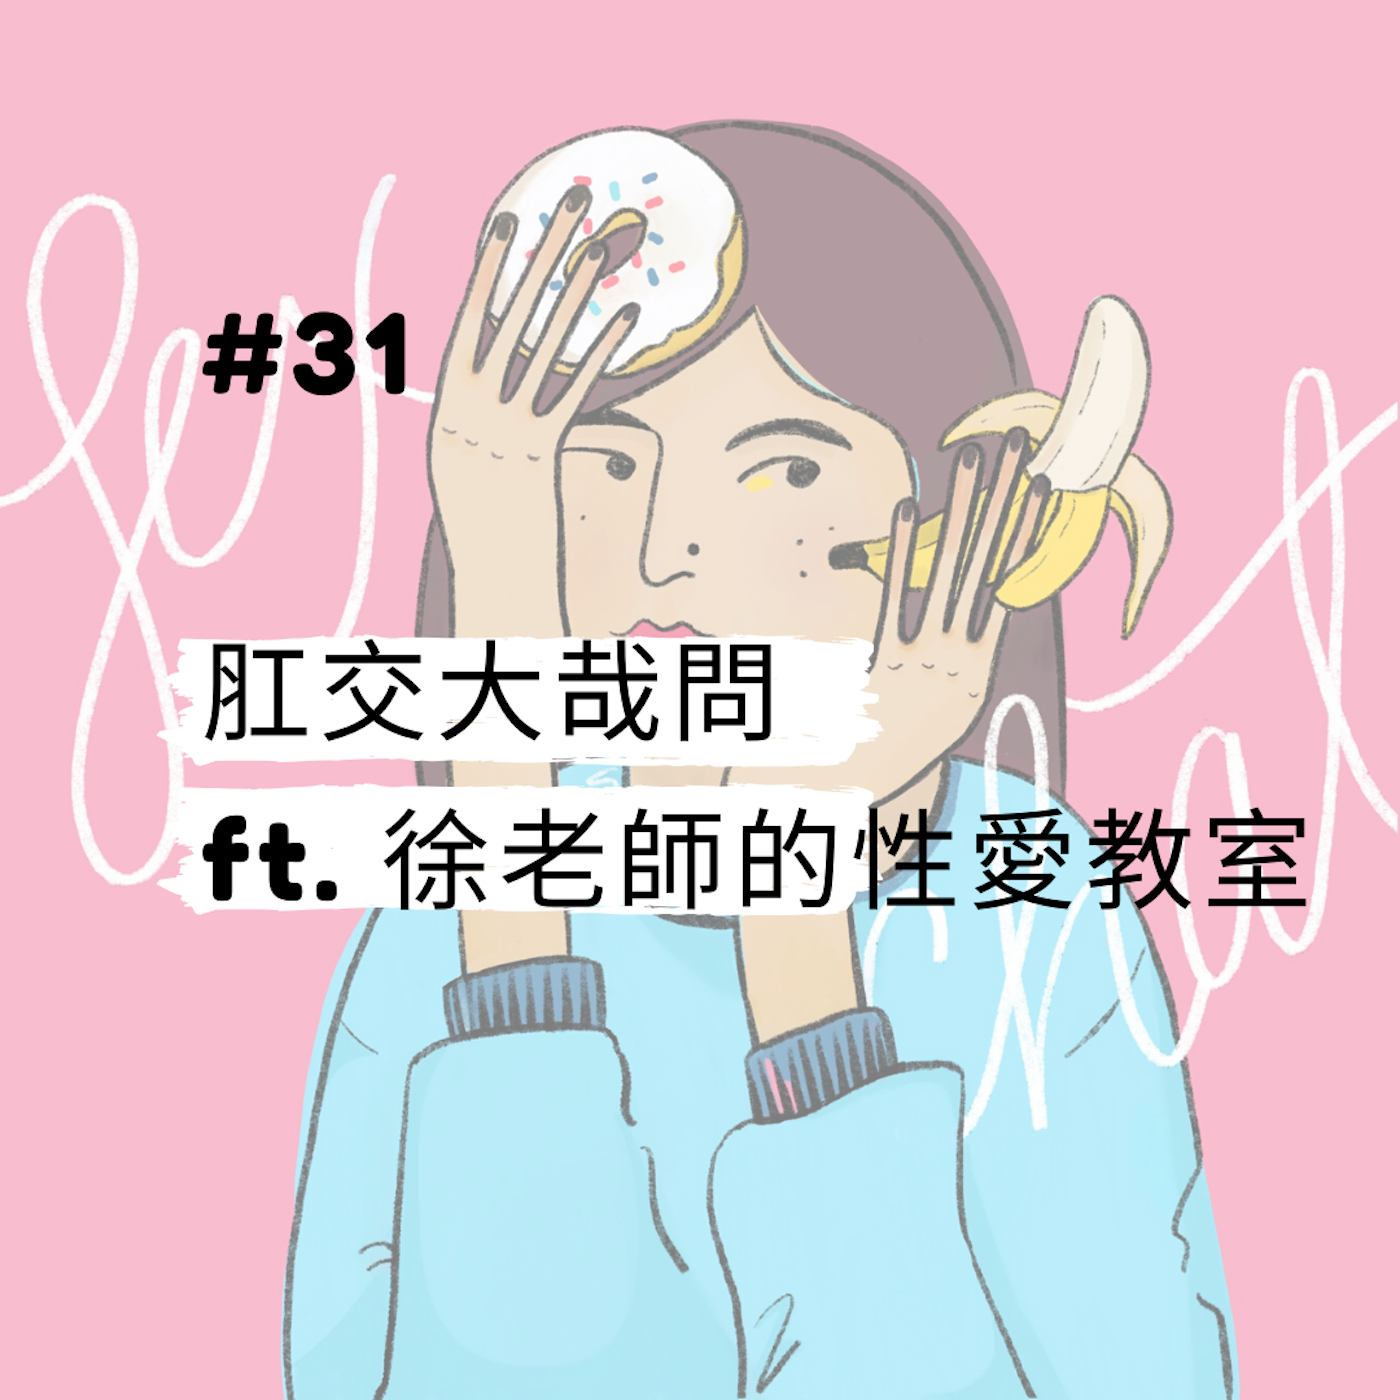 Sex Chat podcast #31 肛交大哉問 ft. 徐老師的性愛教室